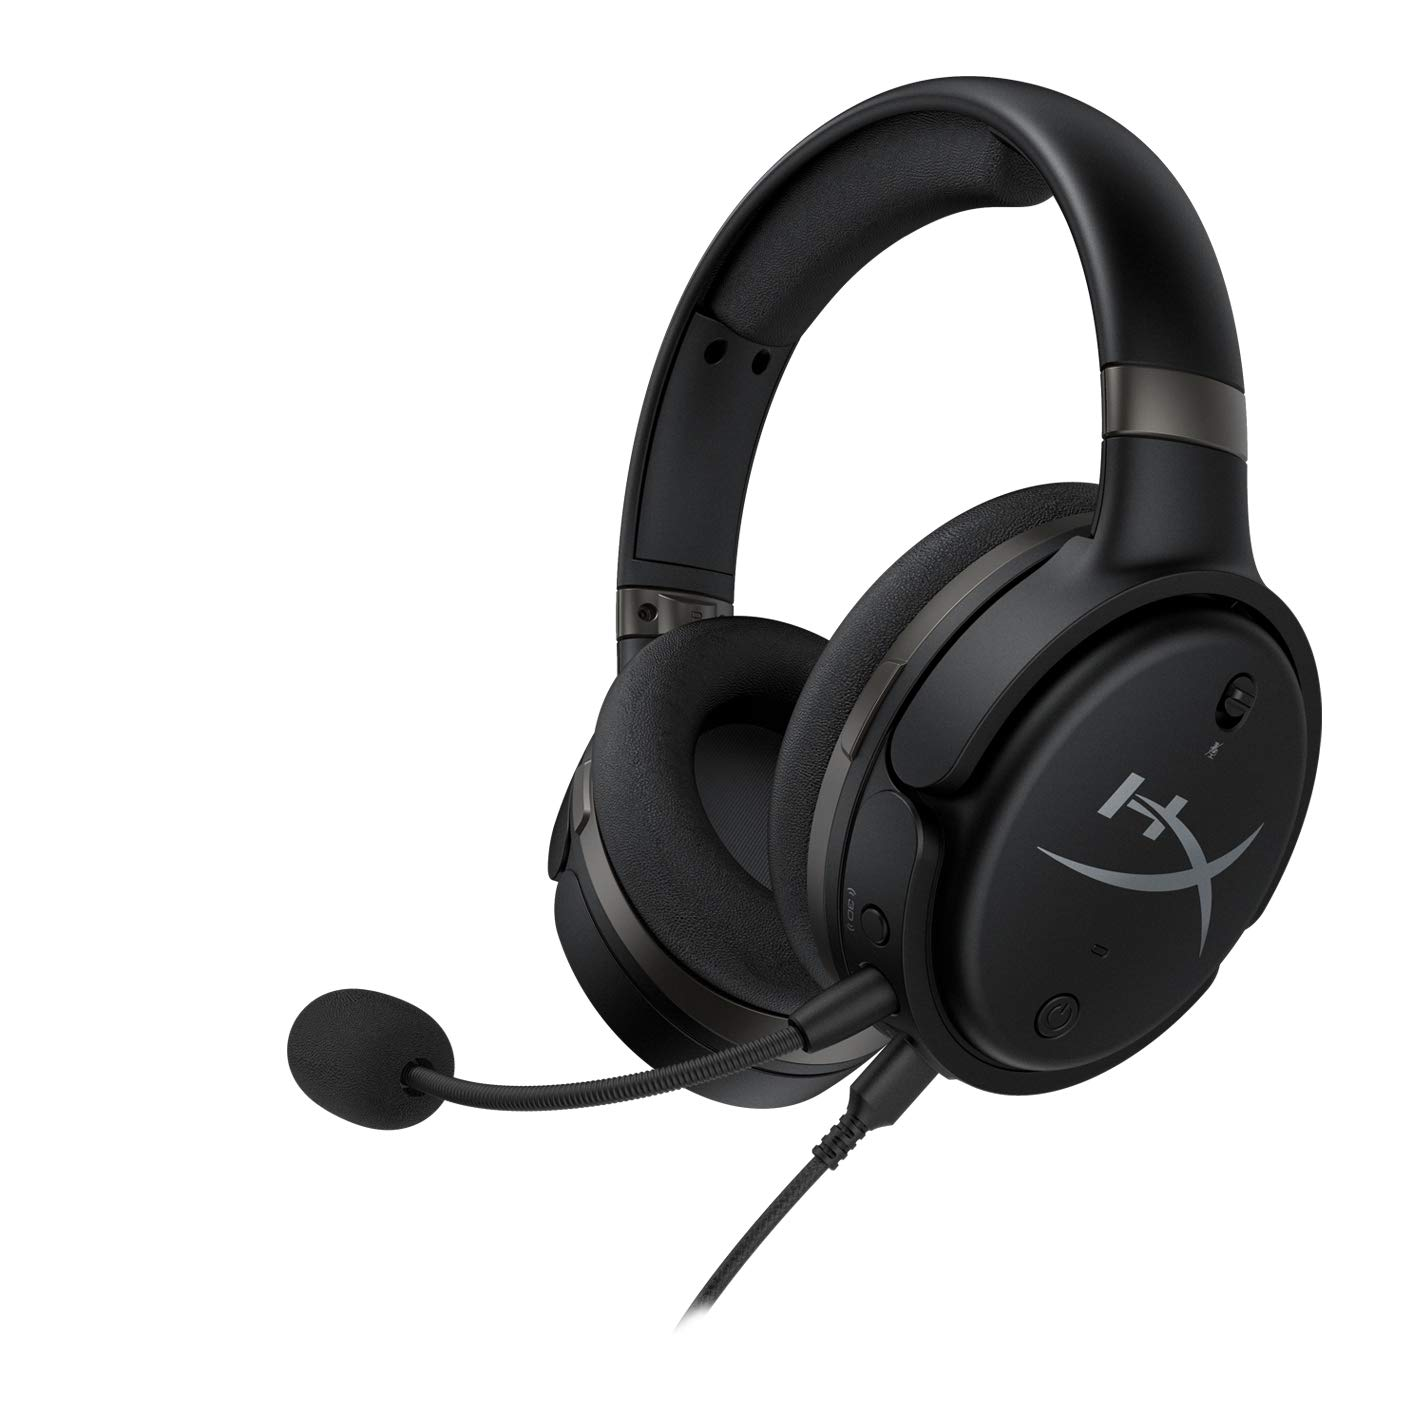 Auriculares Gaming Hyperx Cloud Orbit 3d Audio Nuevo 2019 Para Pc, Xbox One, Ps4, Mac, Planar Magnetic Drive